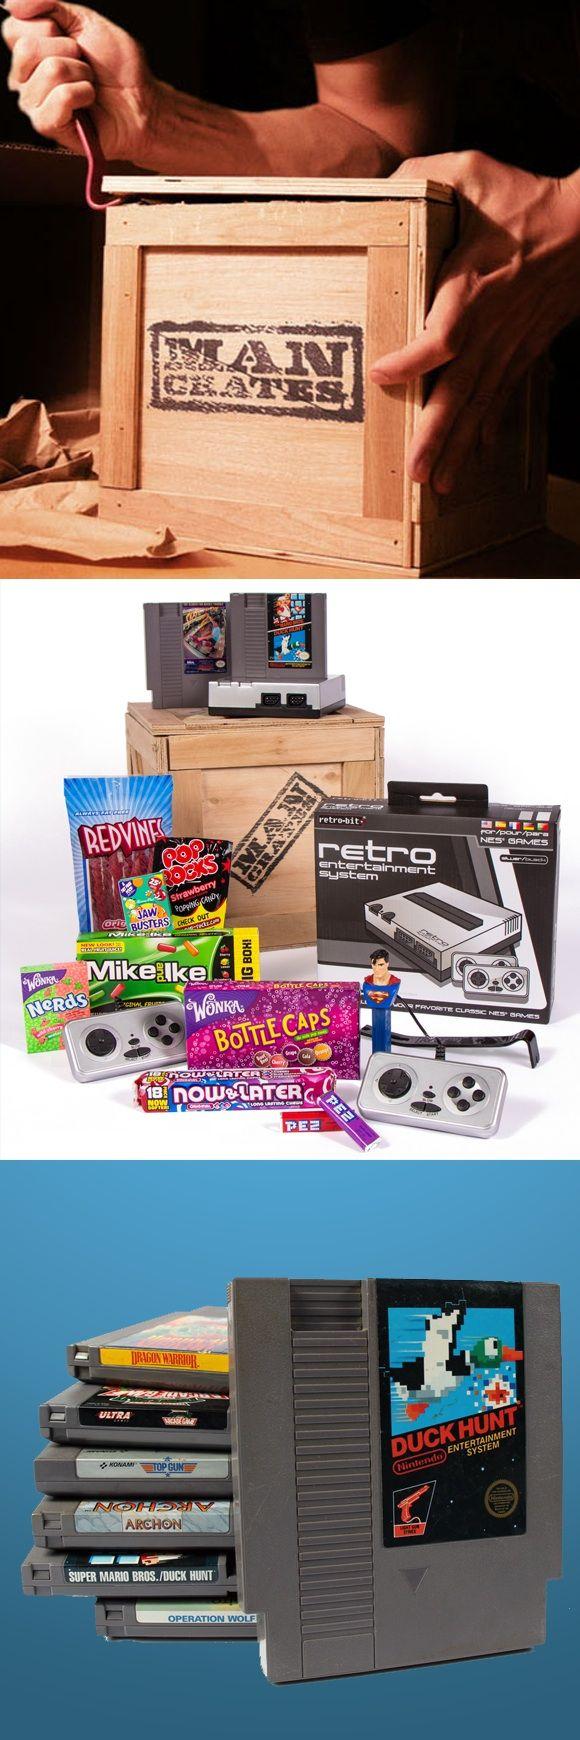 90's nostalgia gift for the gamer geek. #mancrates